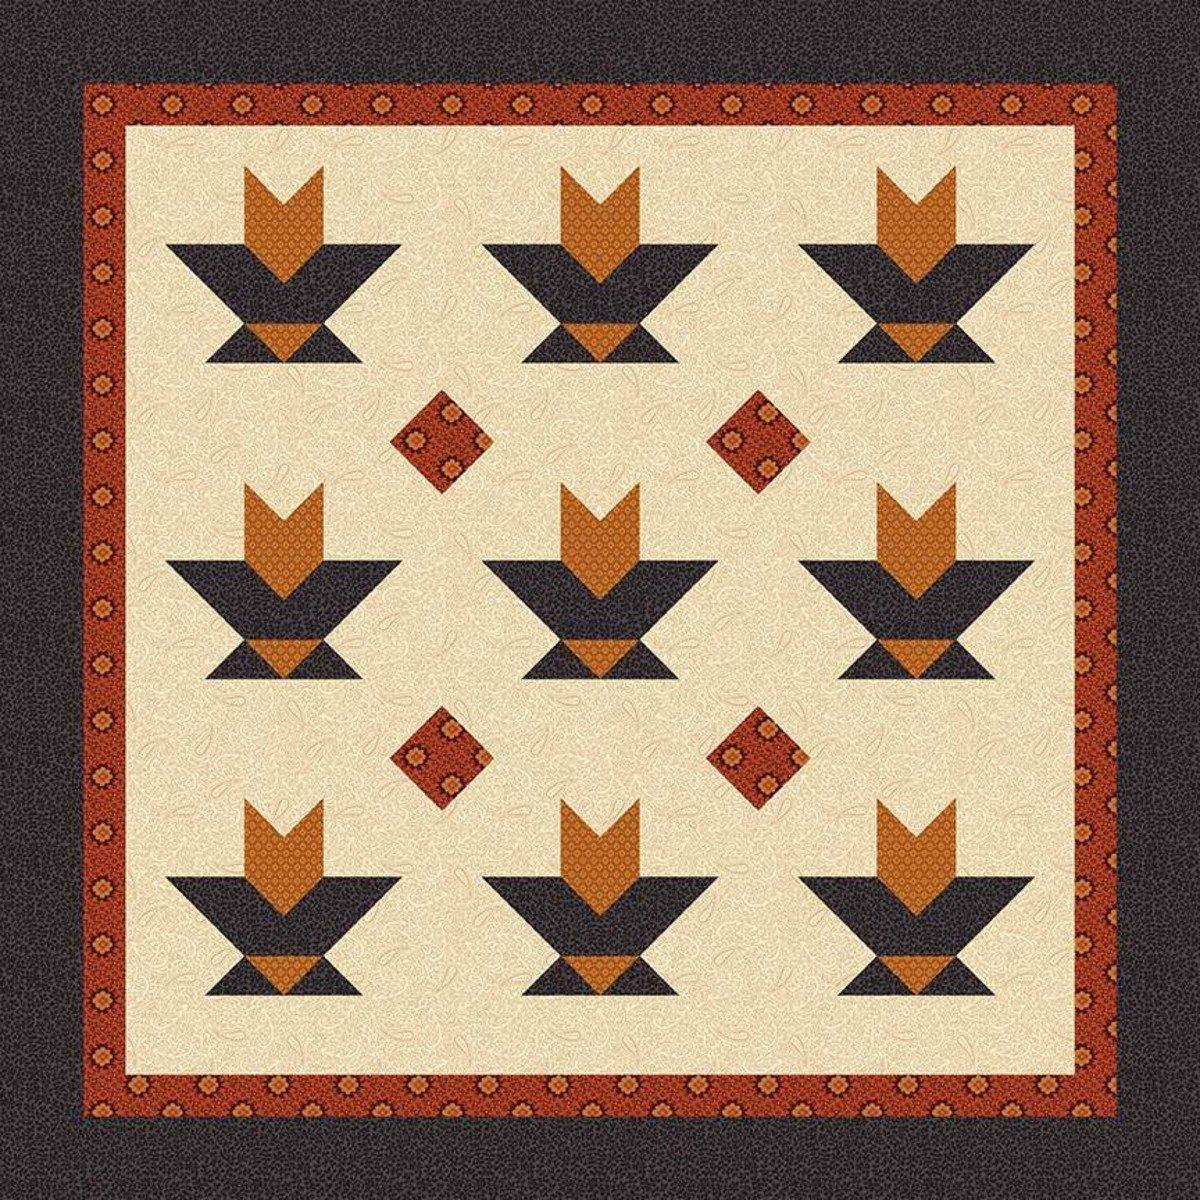 Cactus Basket Quilt Pattern